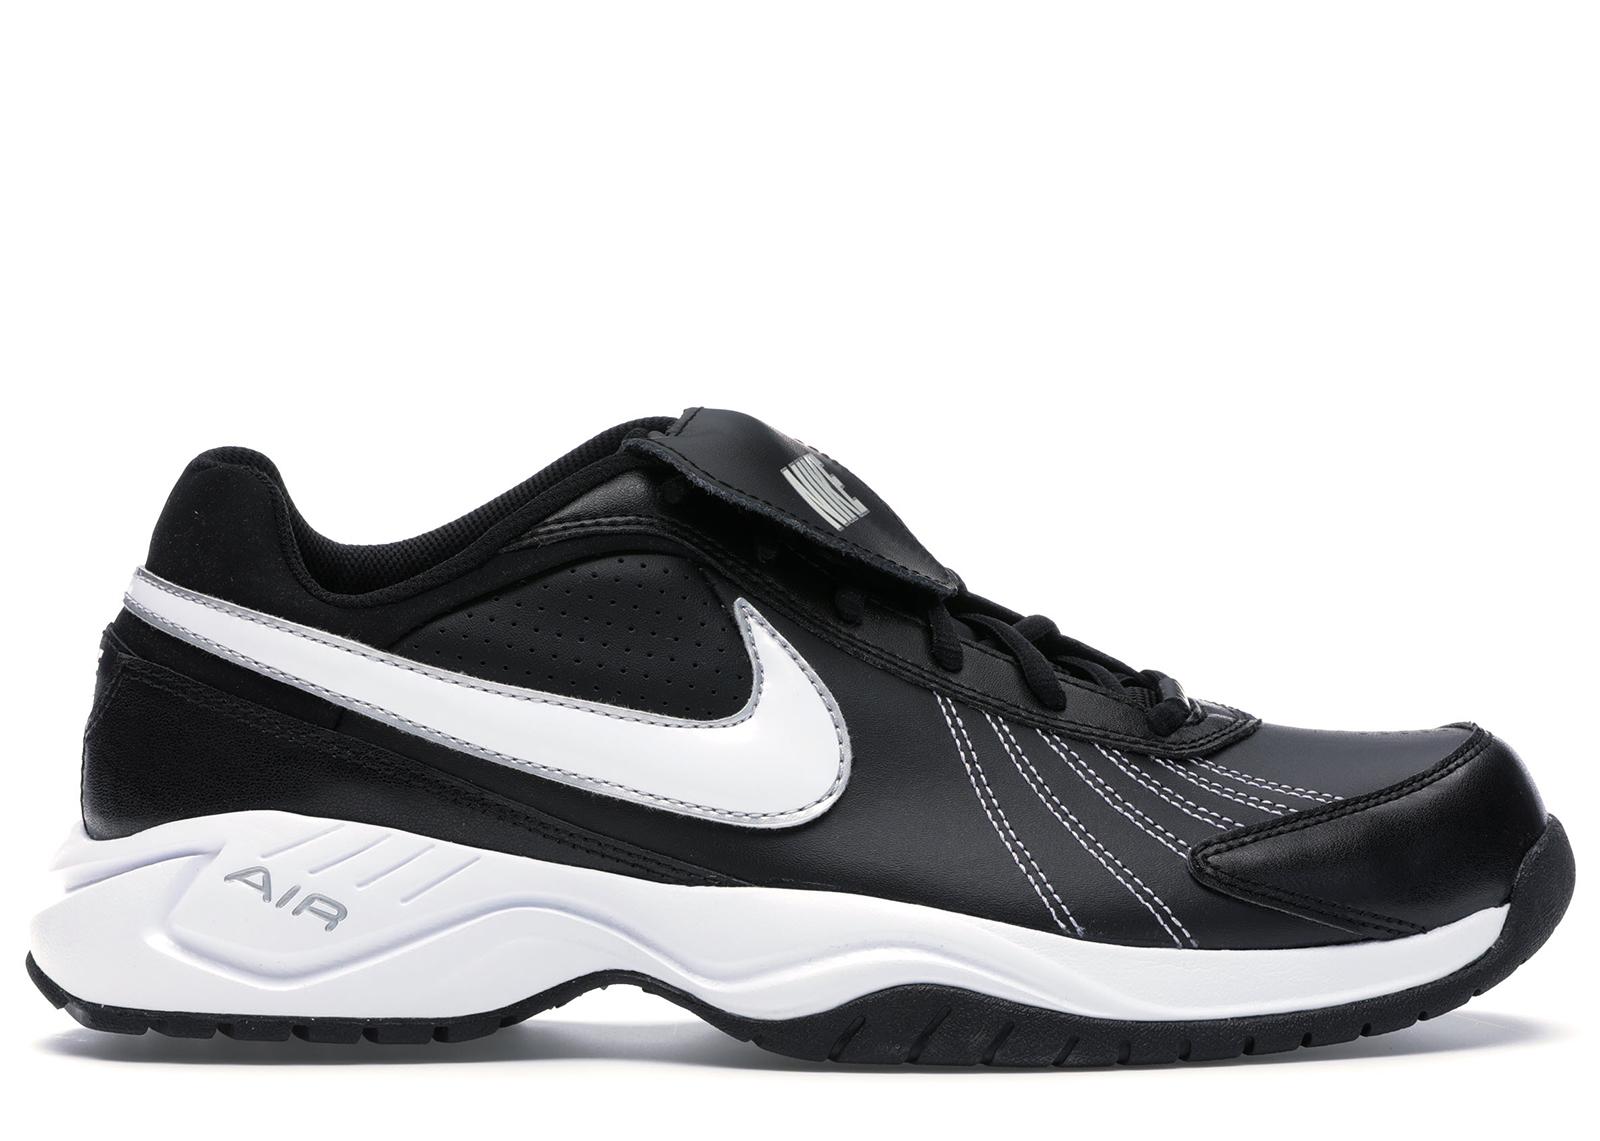 Nike Air Diamond Trainer Black White